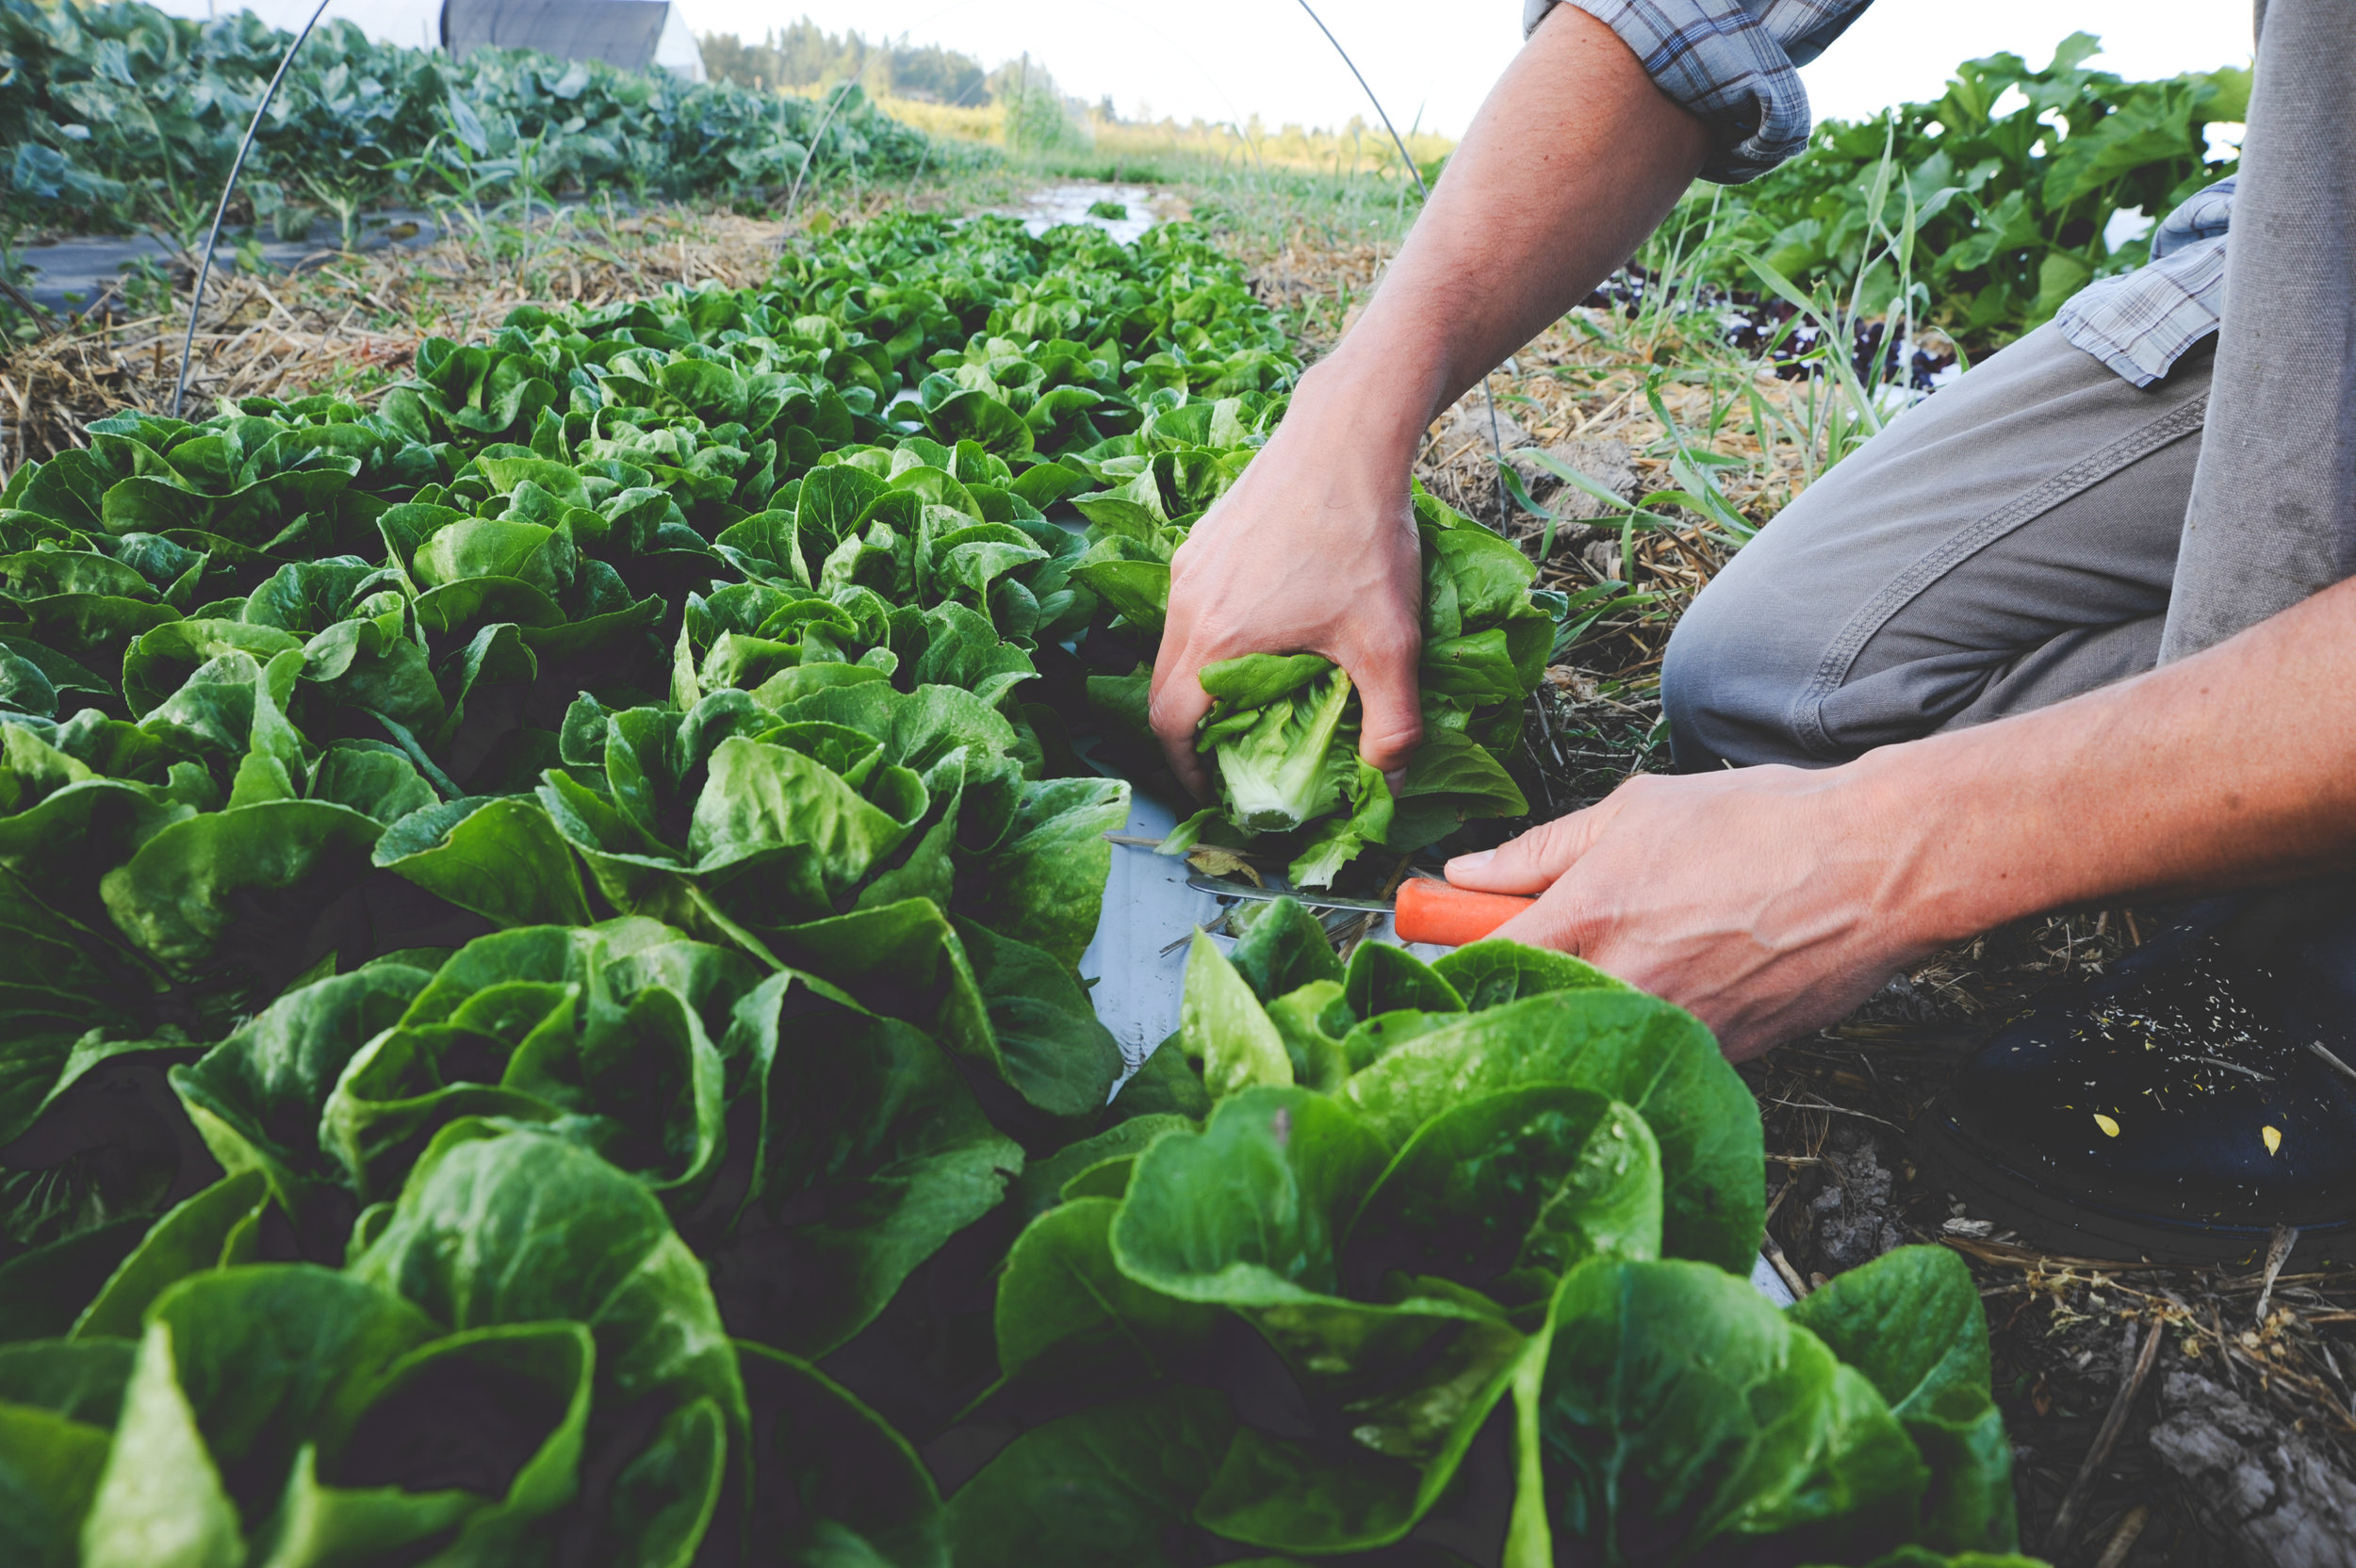 Warm Season Salad Greens_Seattle Urban Farm Co.